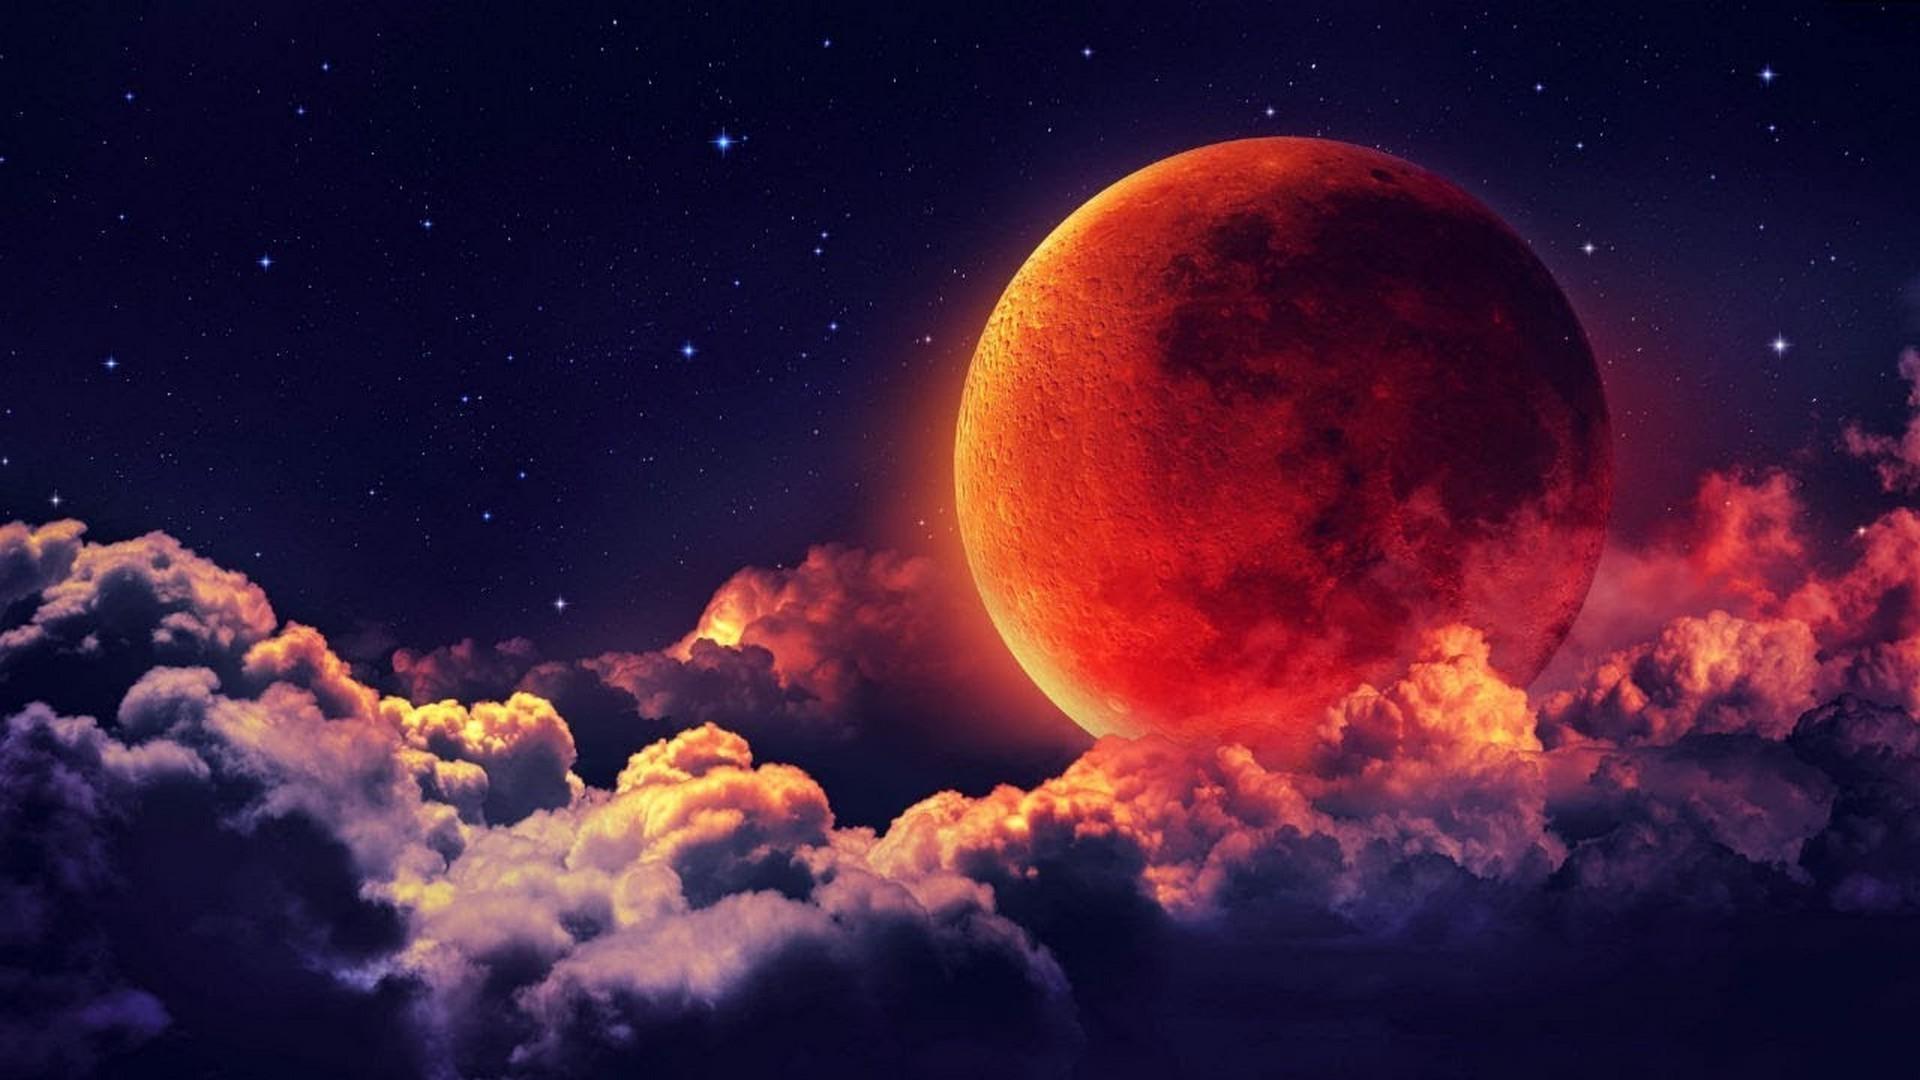 Super Blood Moon Wallpaper 2020 Cute Wallpapers 1920x1080